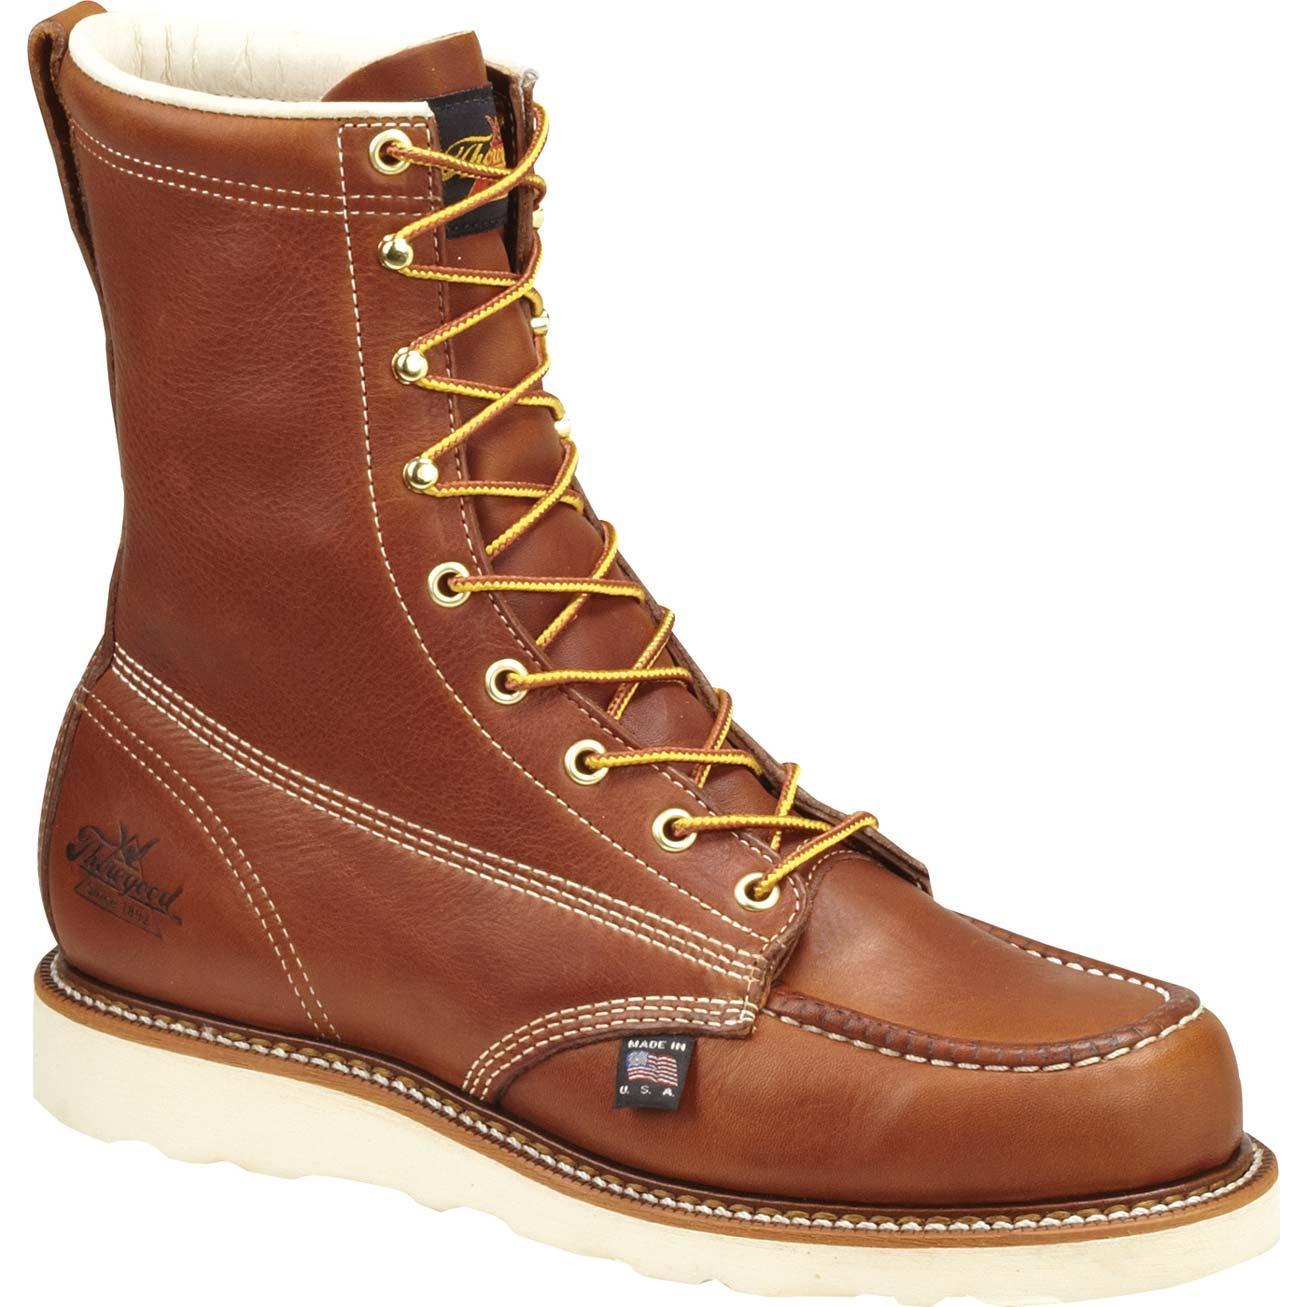 Thorogood Steel Toe Wedge Sole Work Boots 804 4208